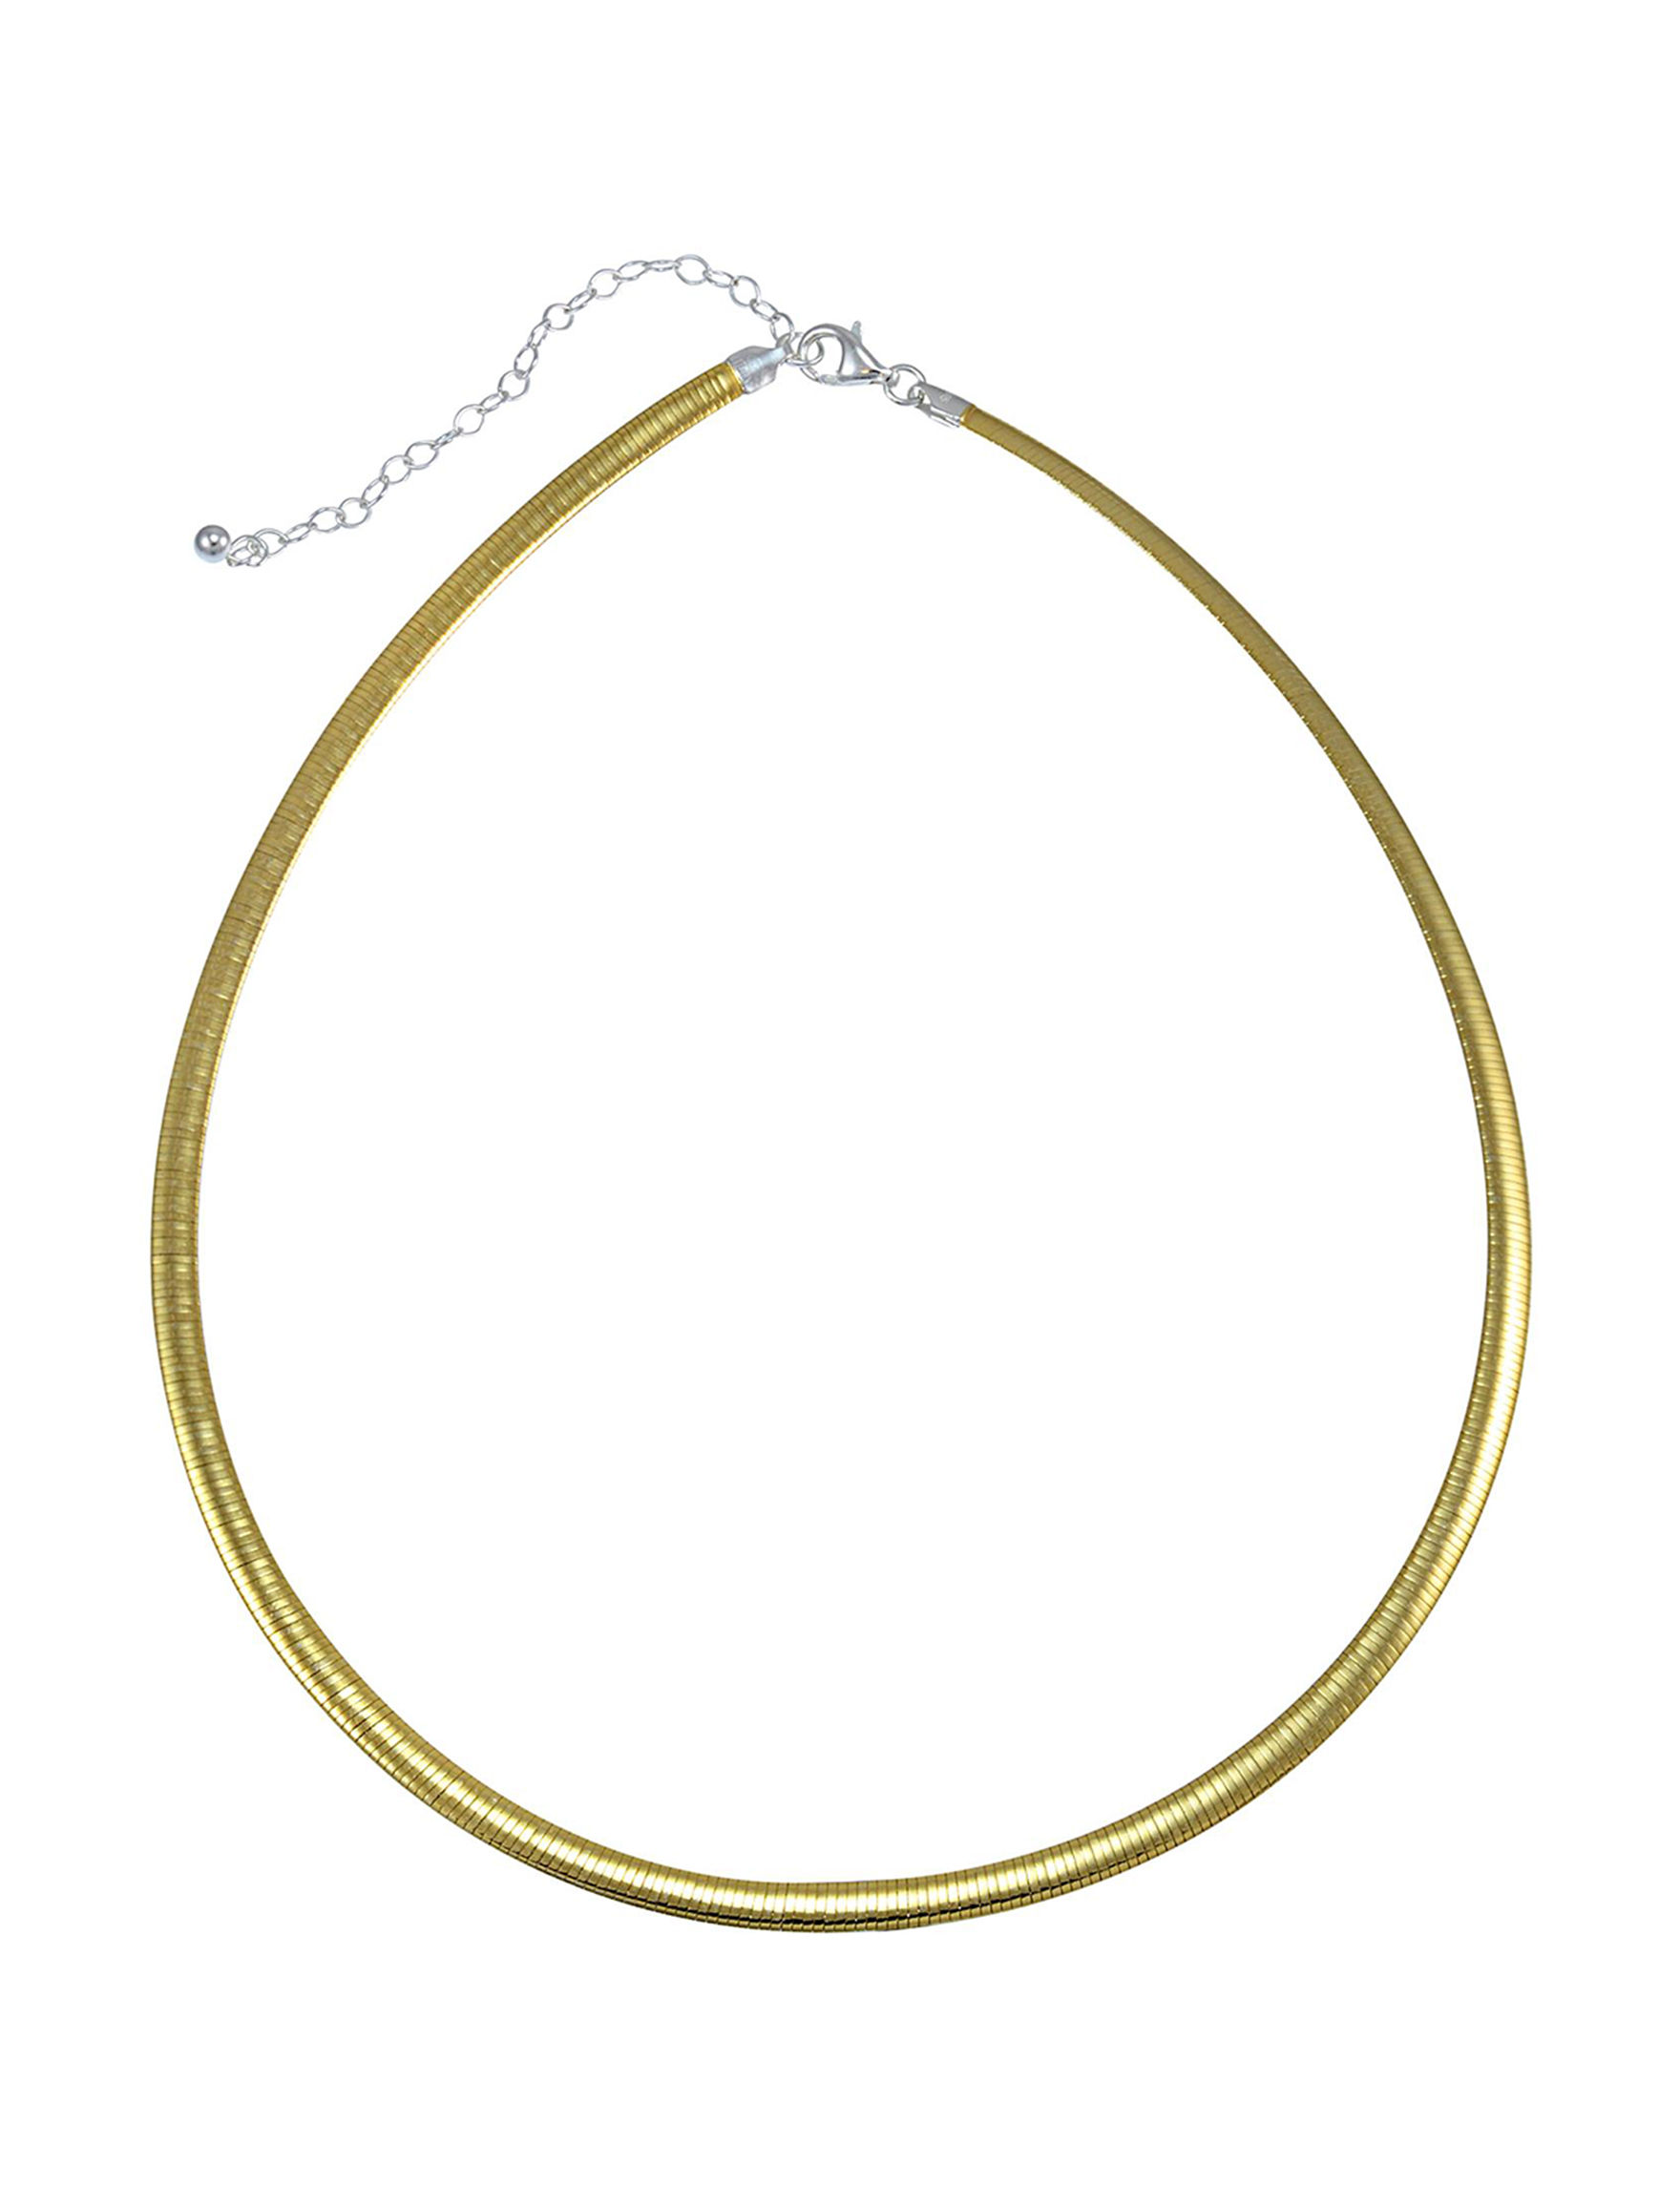 FMC Gold Necklaces & Pendants Fine Jewelry